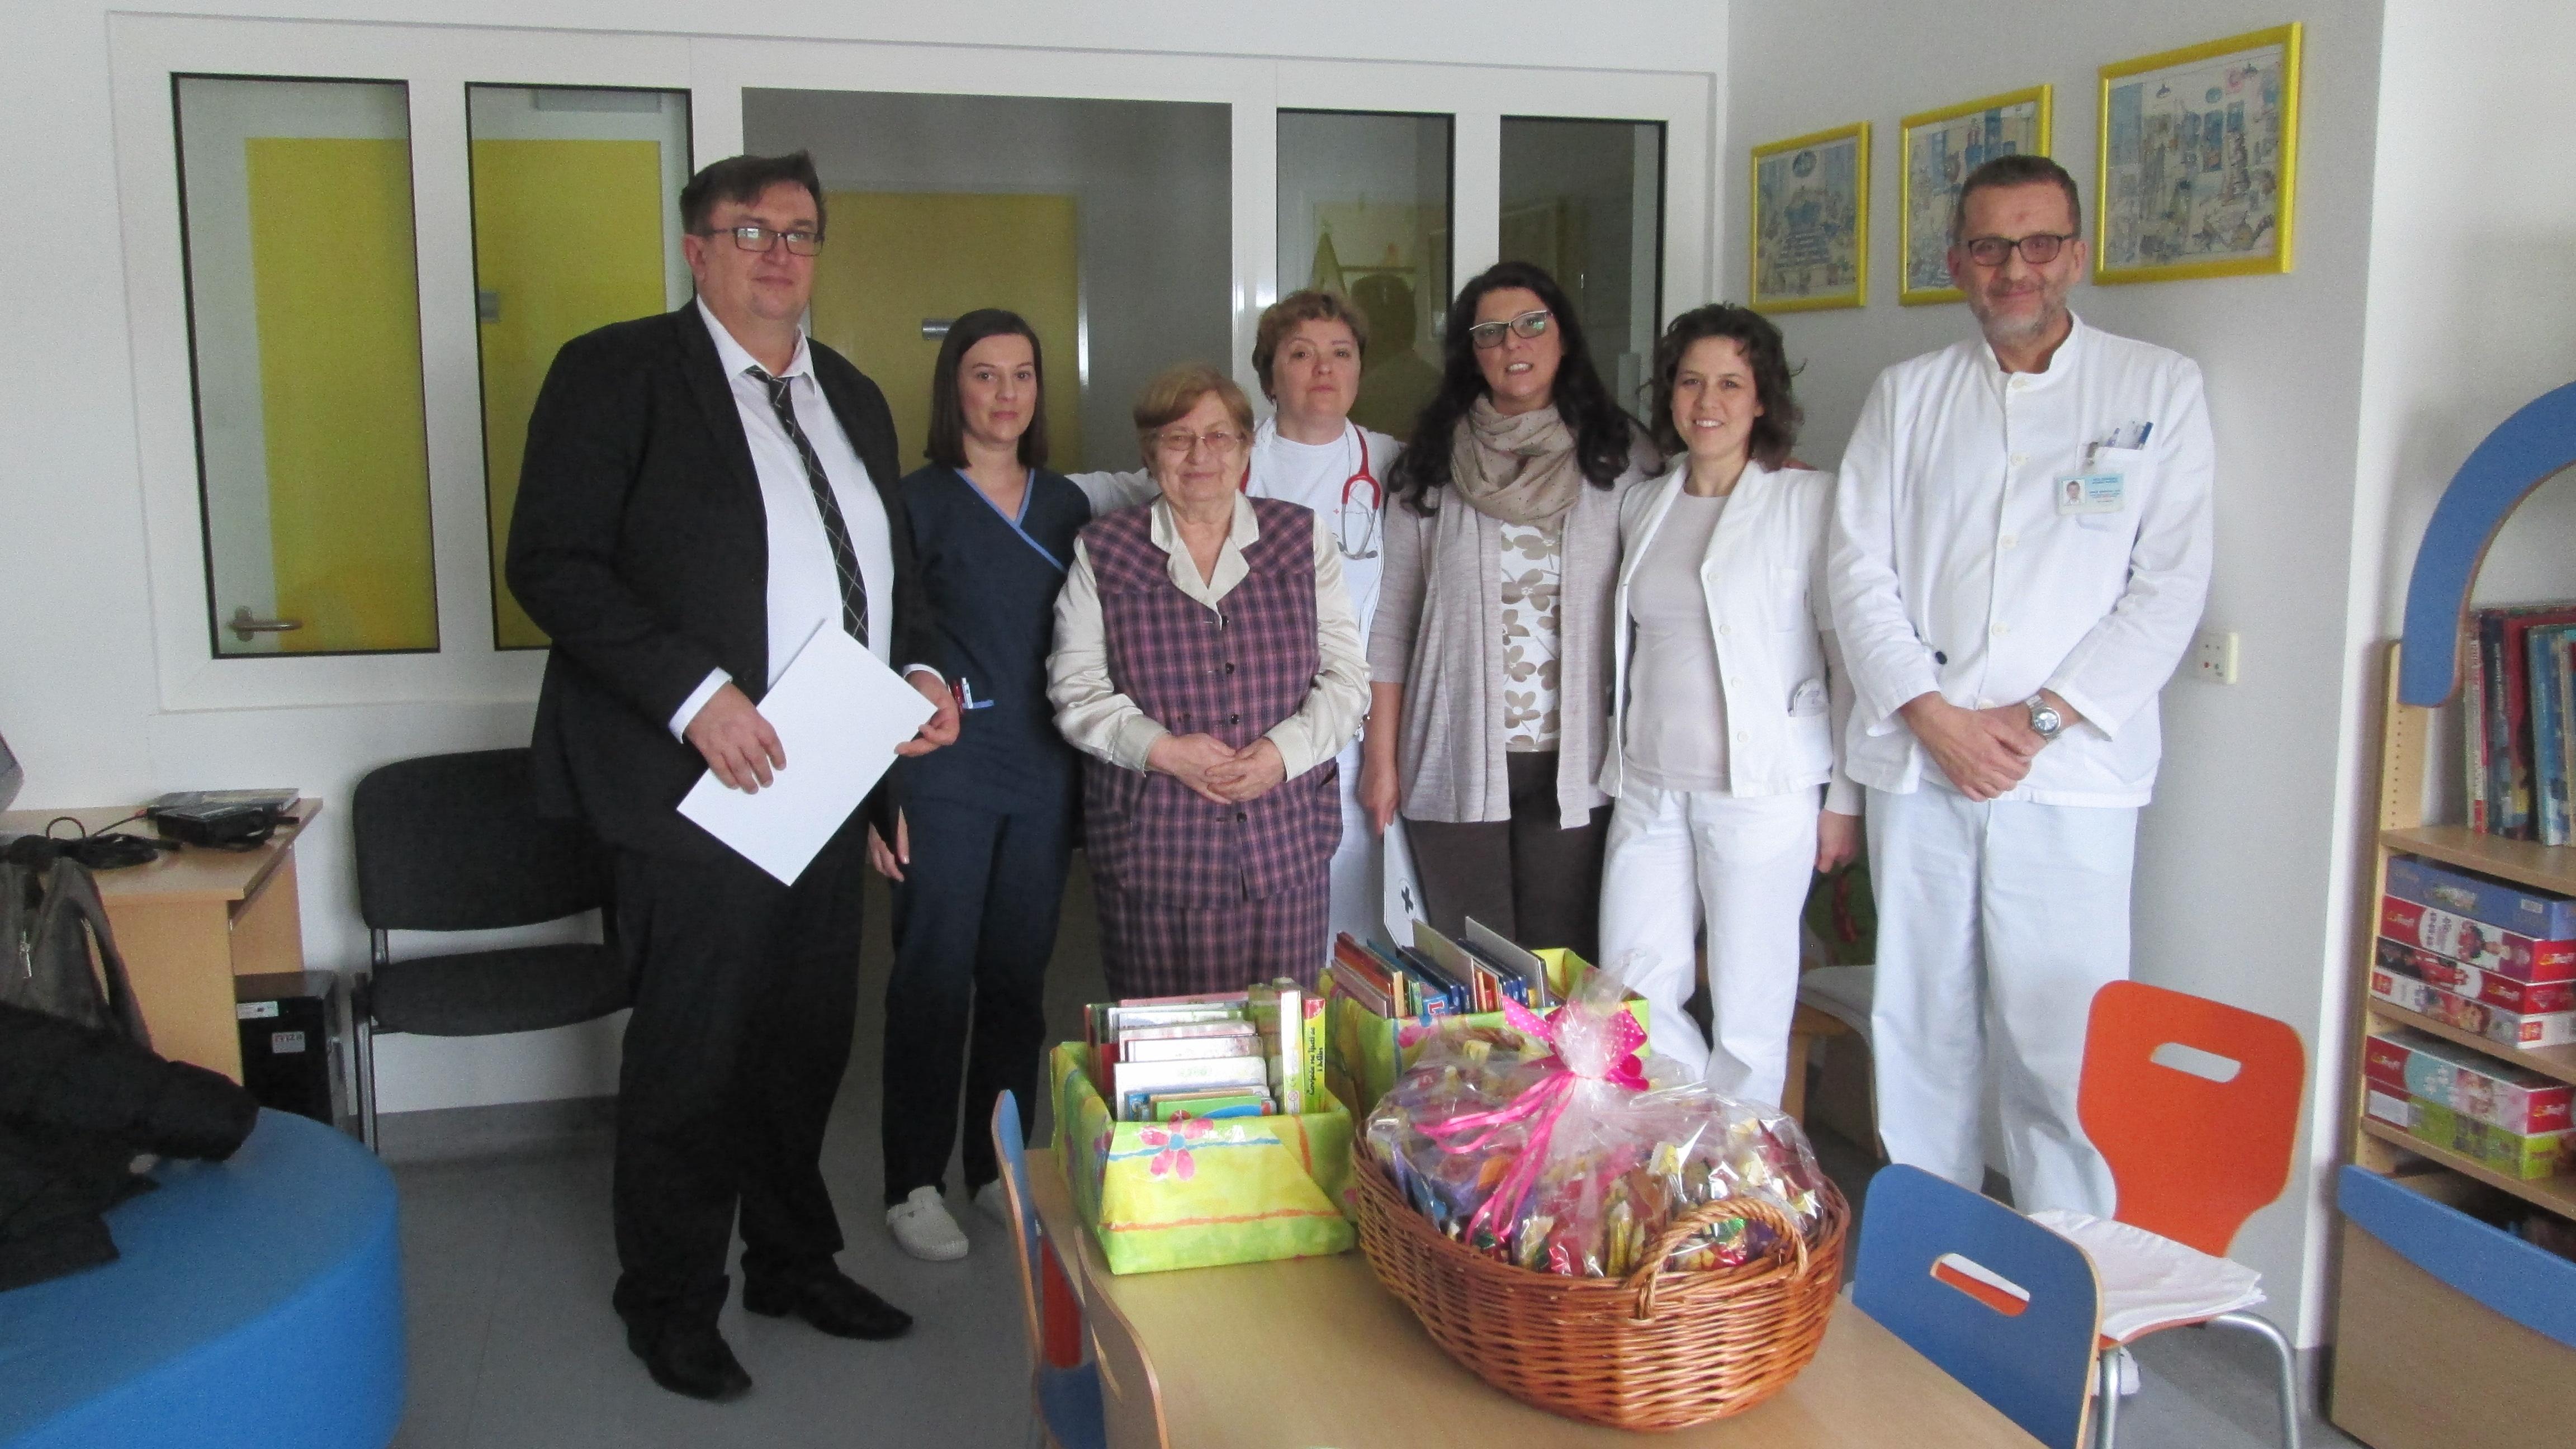 Darivanje slikovnica OŽB Vukovar